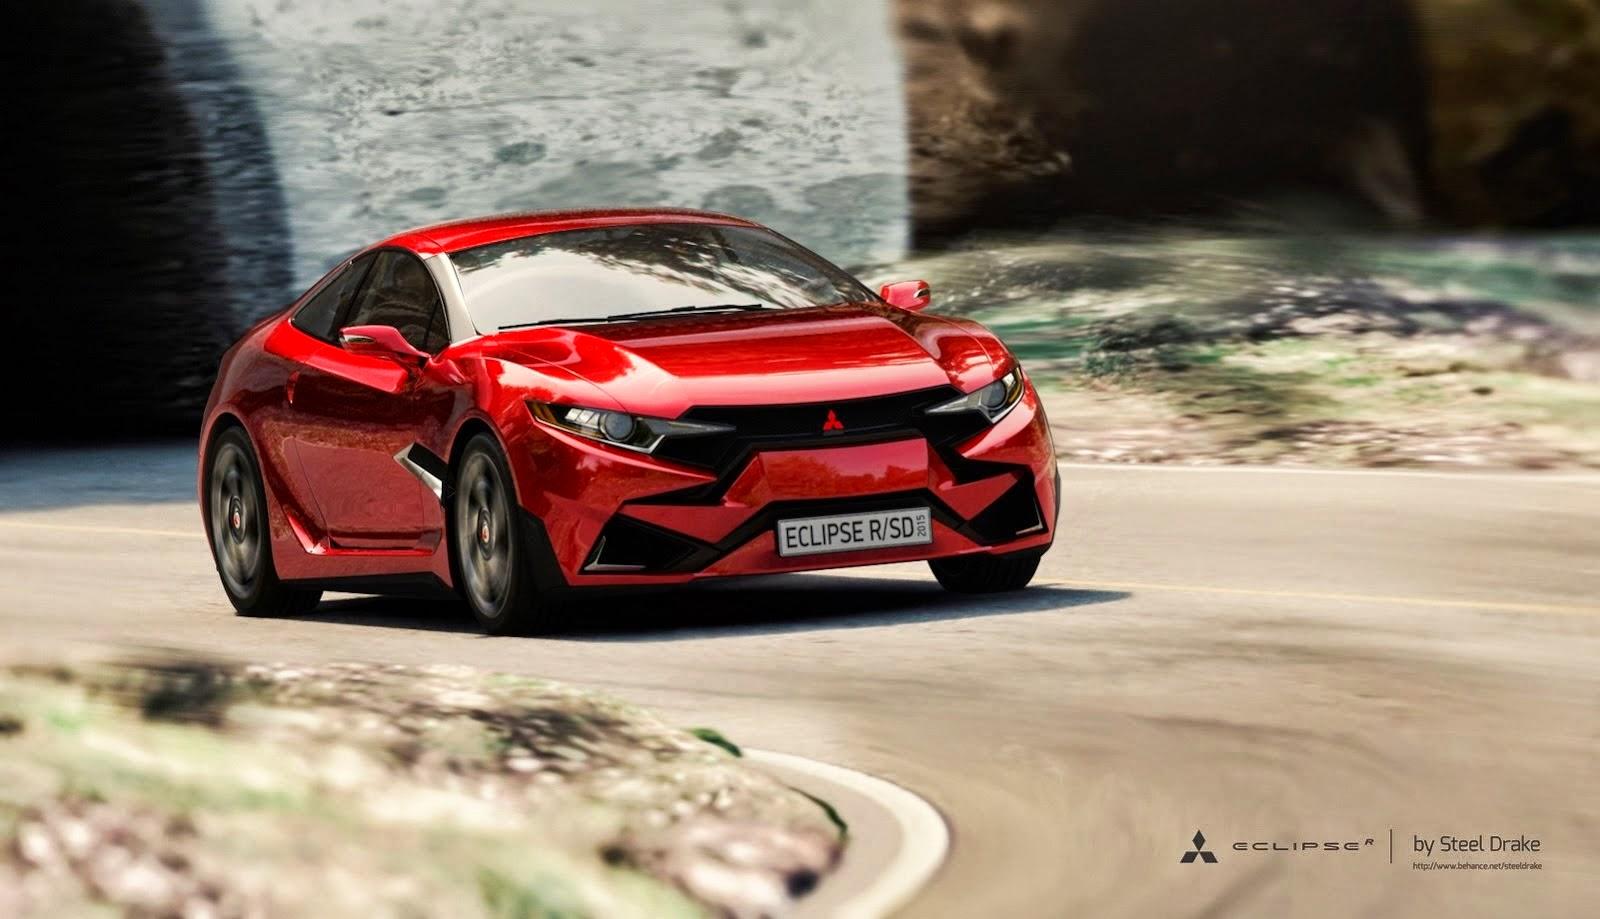 2015 Sports Car